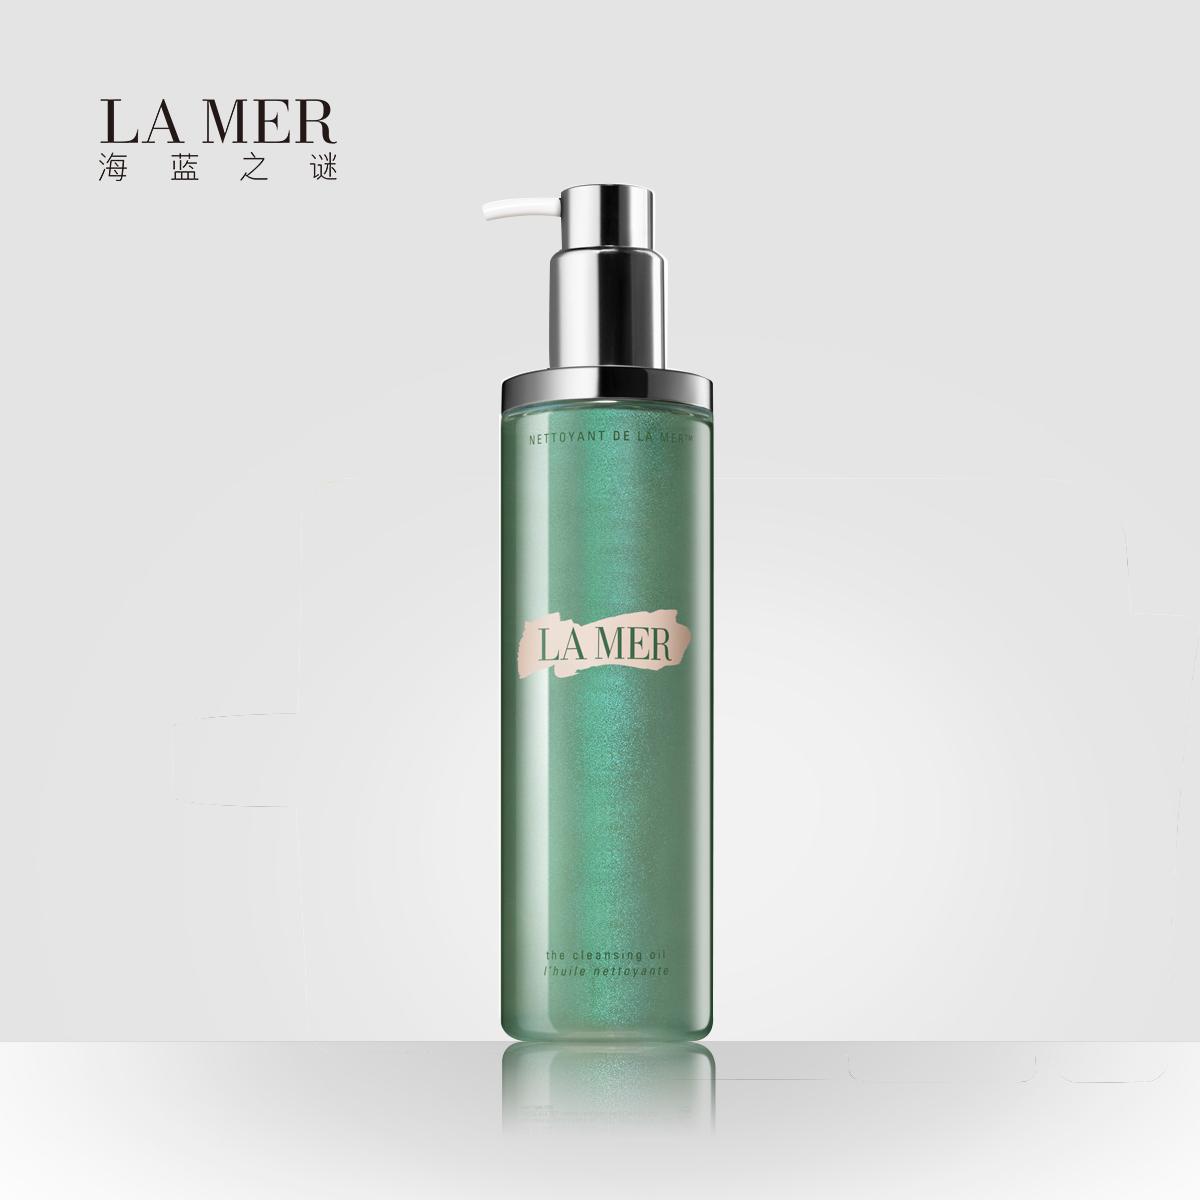 LA MER海蓝之谜洁颜油200ml 卸妆油 面部卸妆